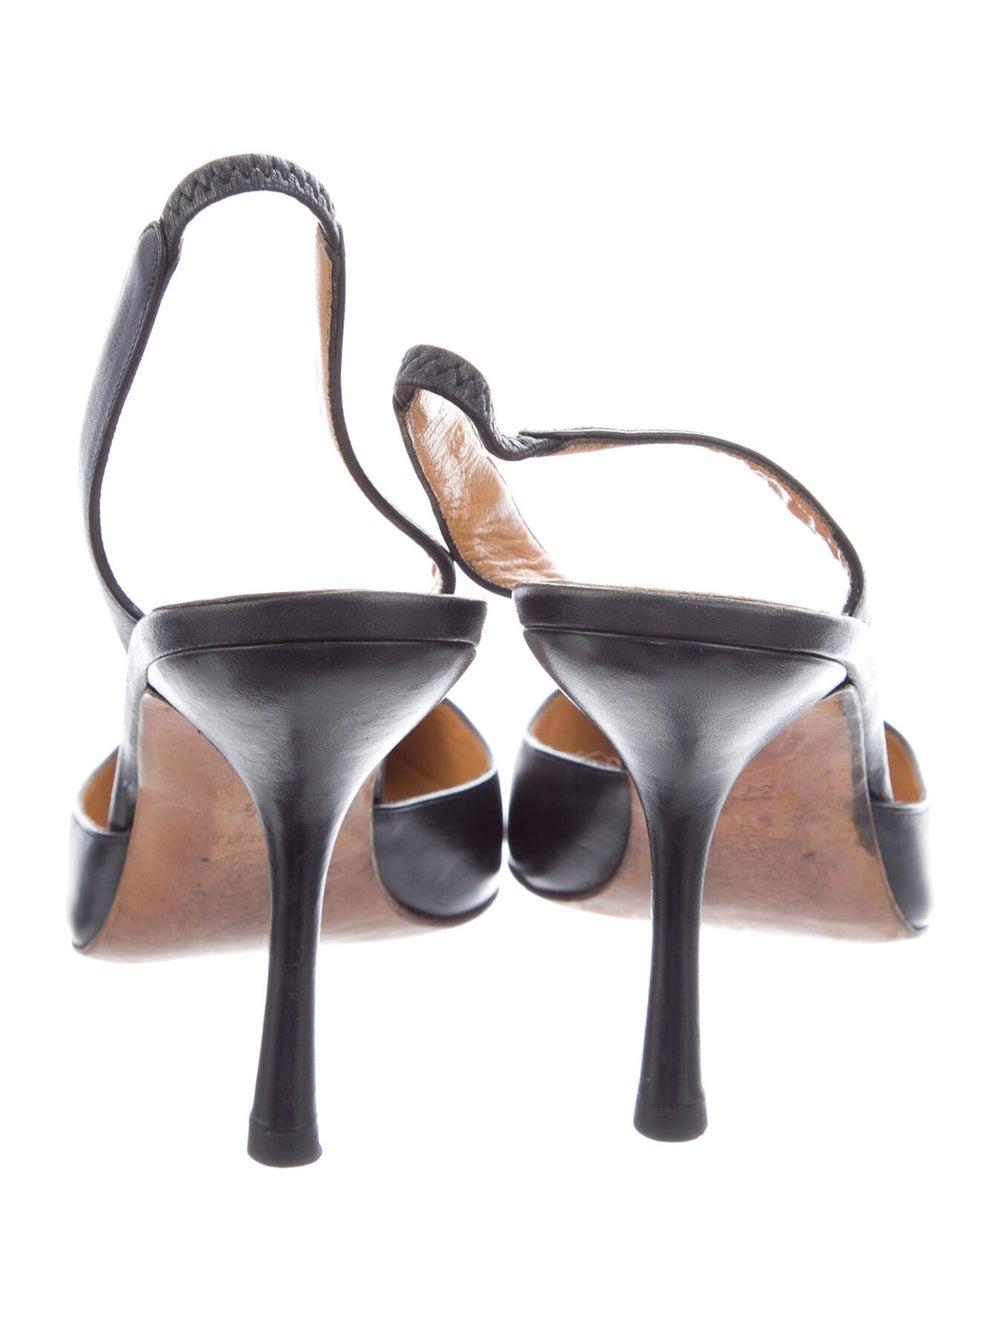 Gianni Versace Leather Slingback Pumps Black - image 4